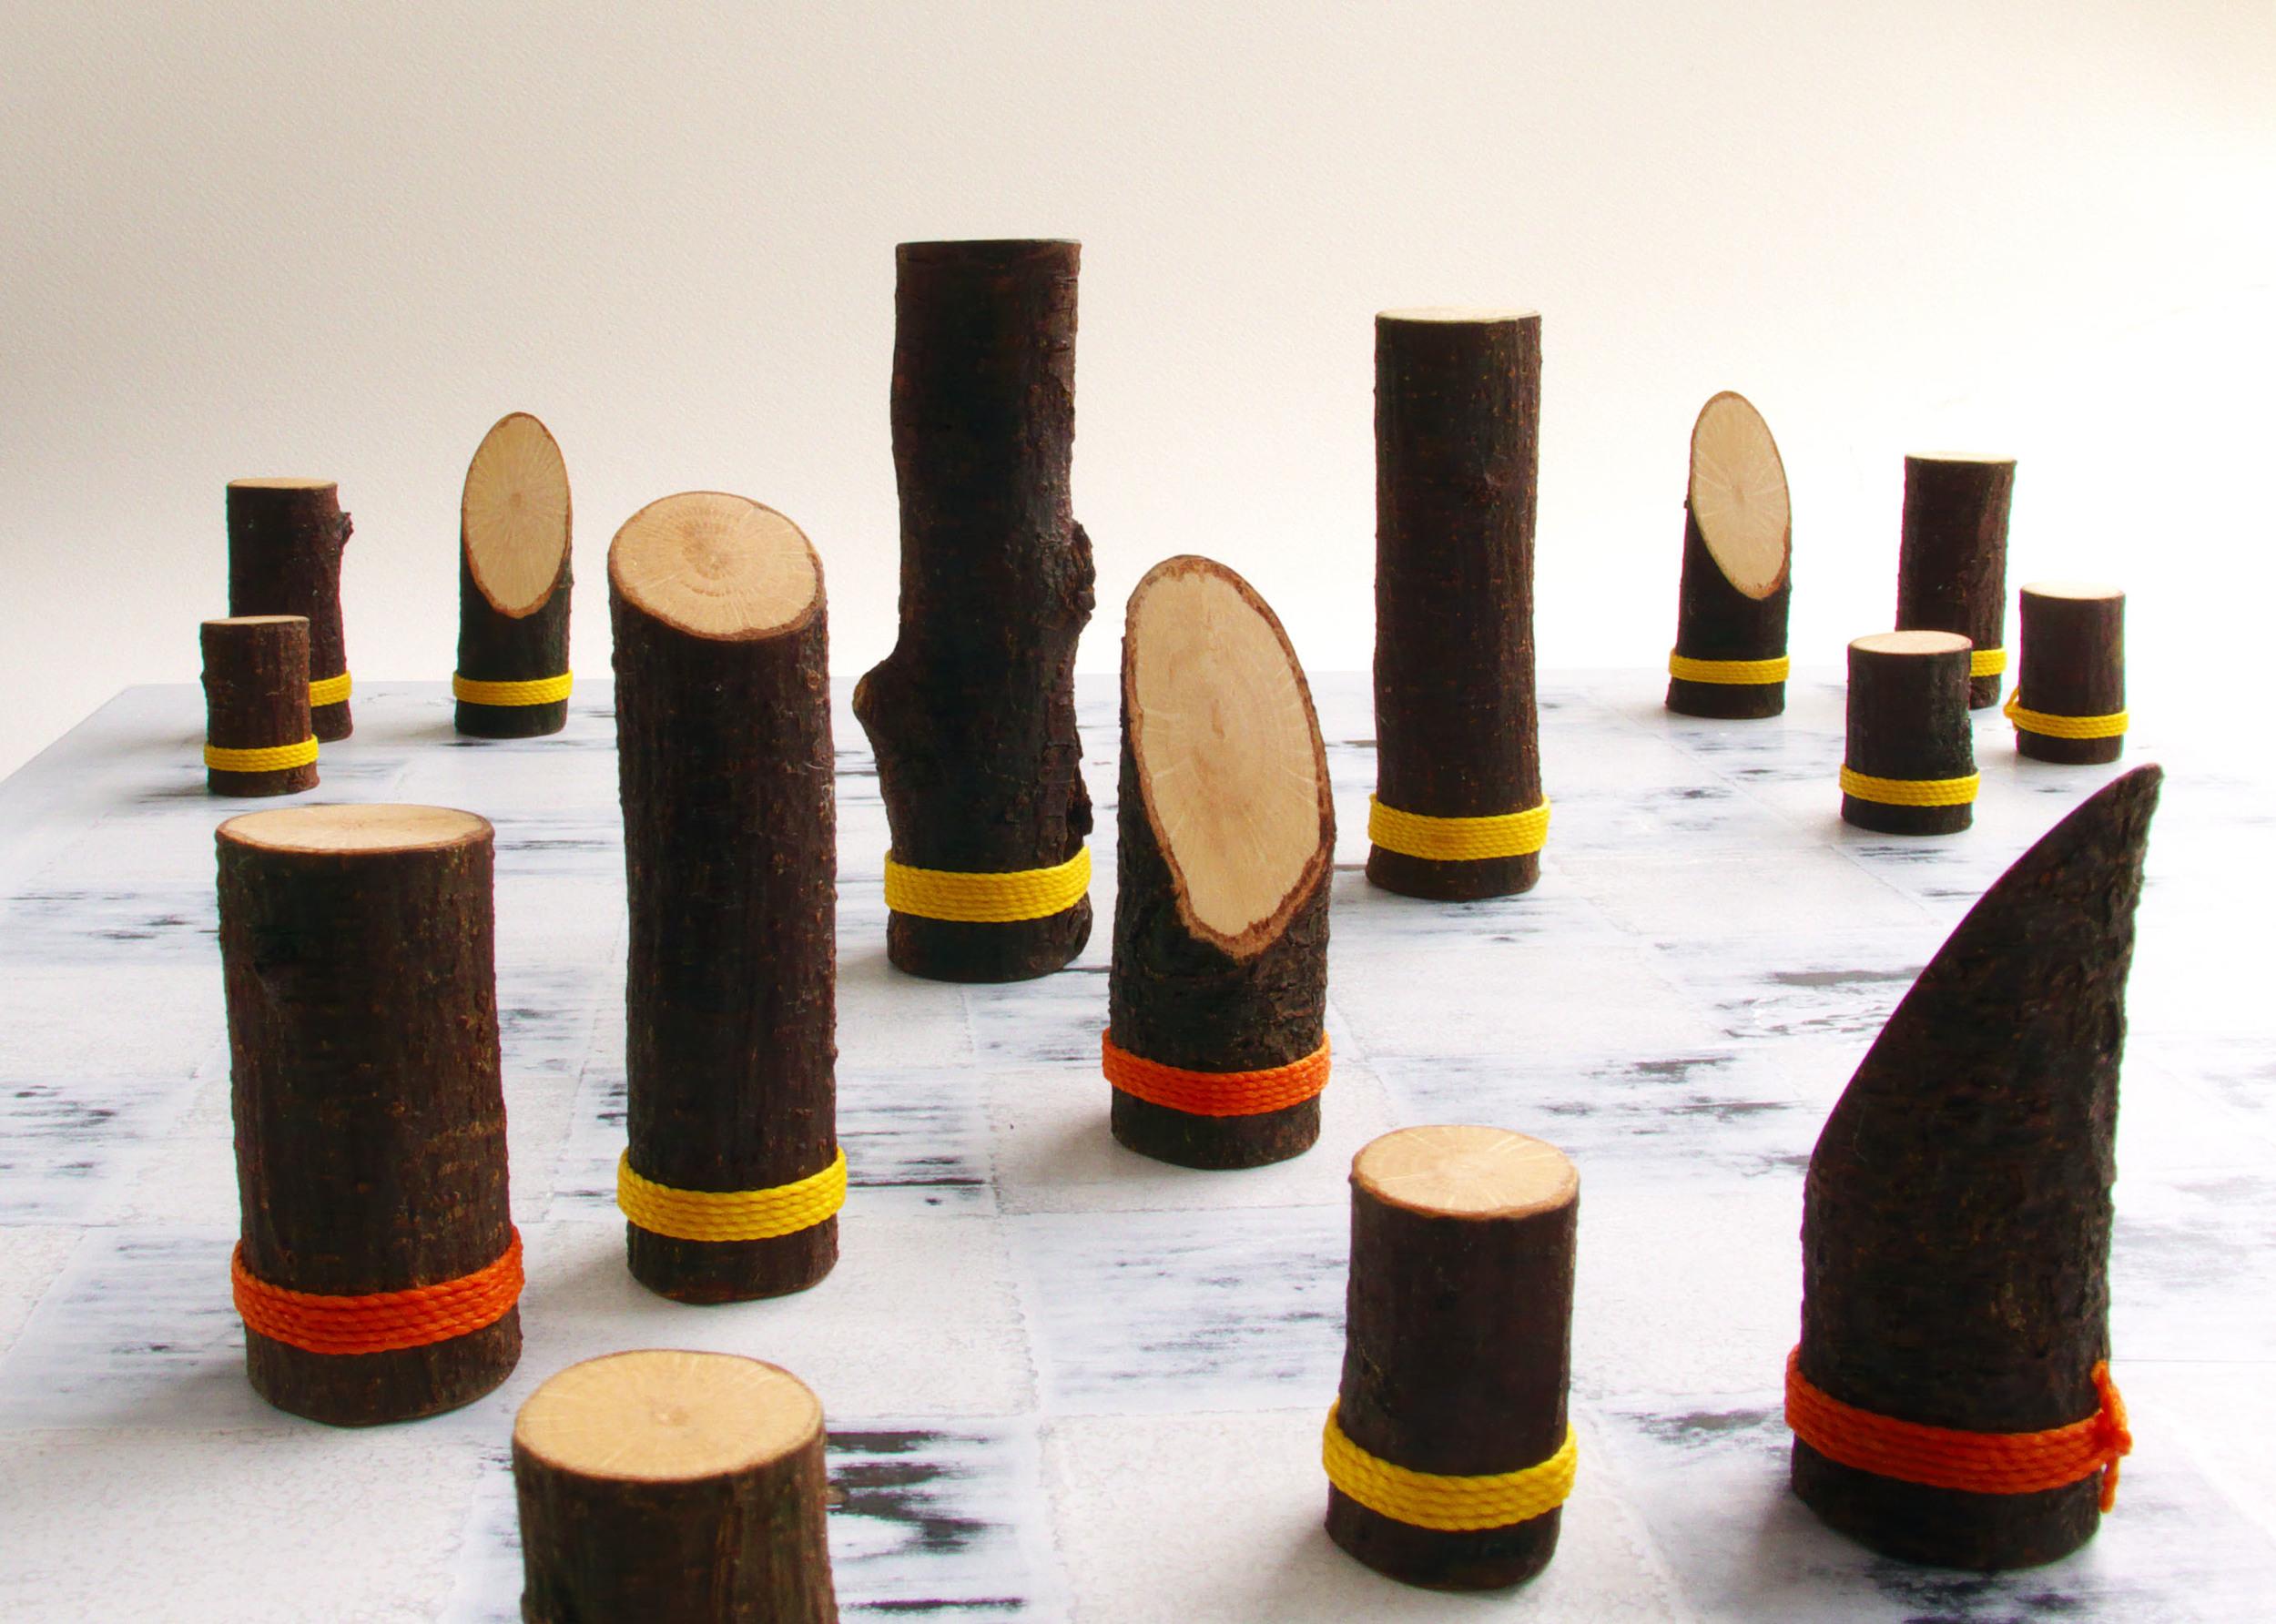 Balanis Chess Set